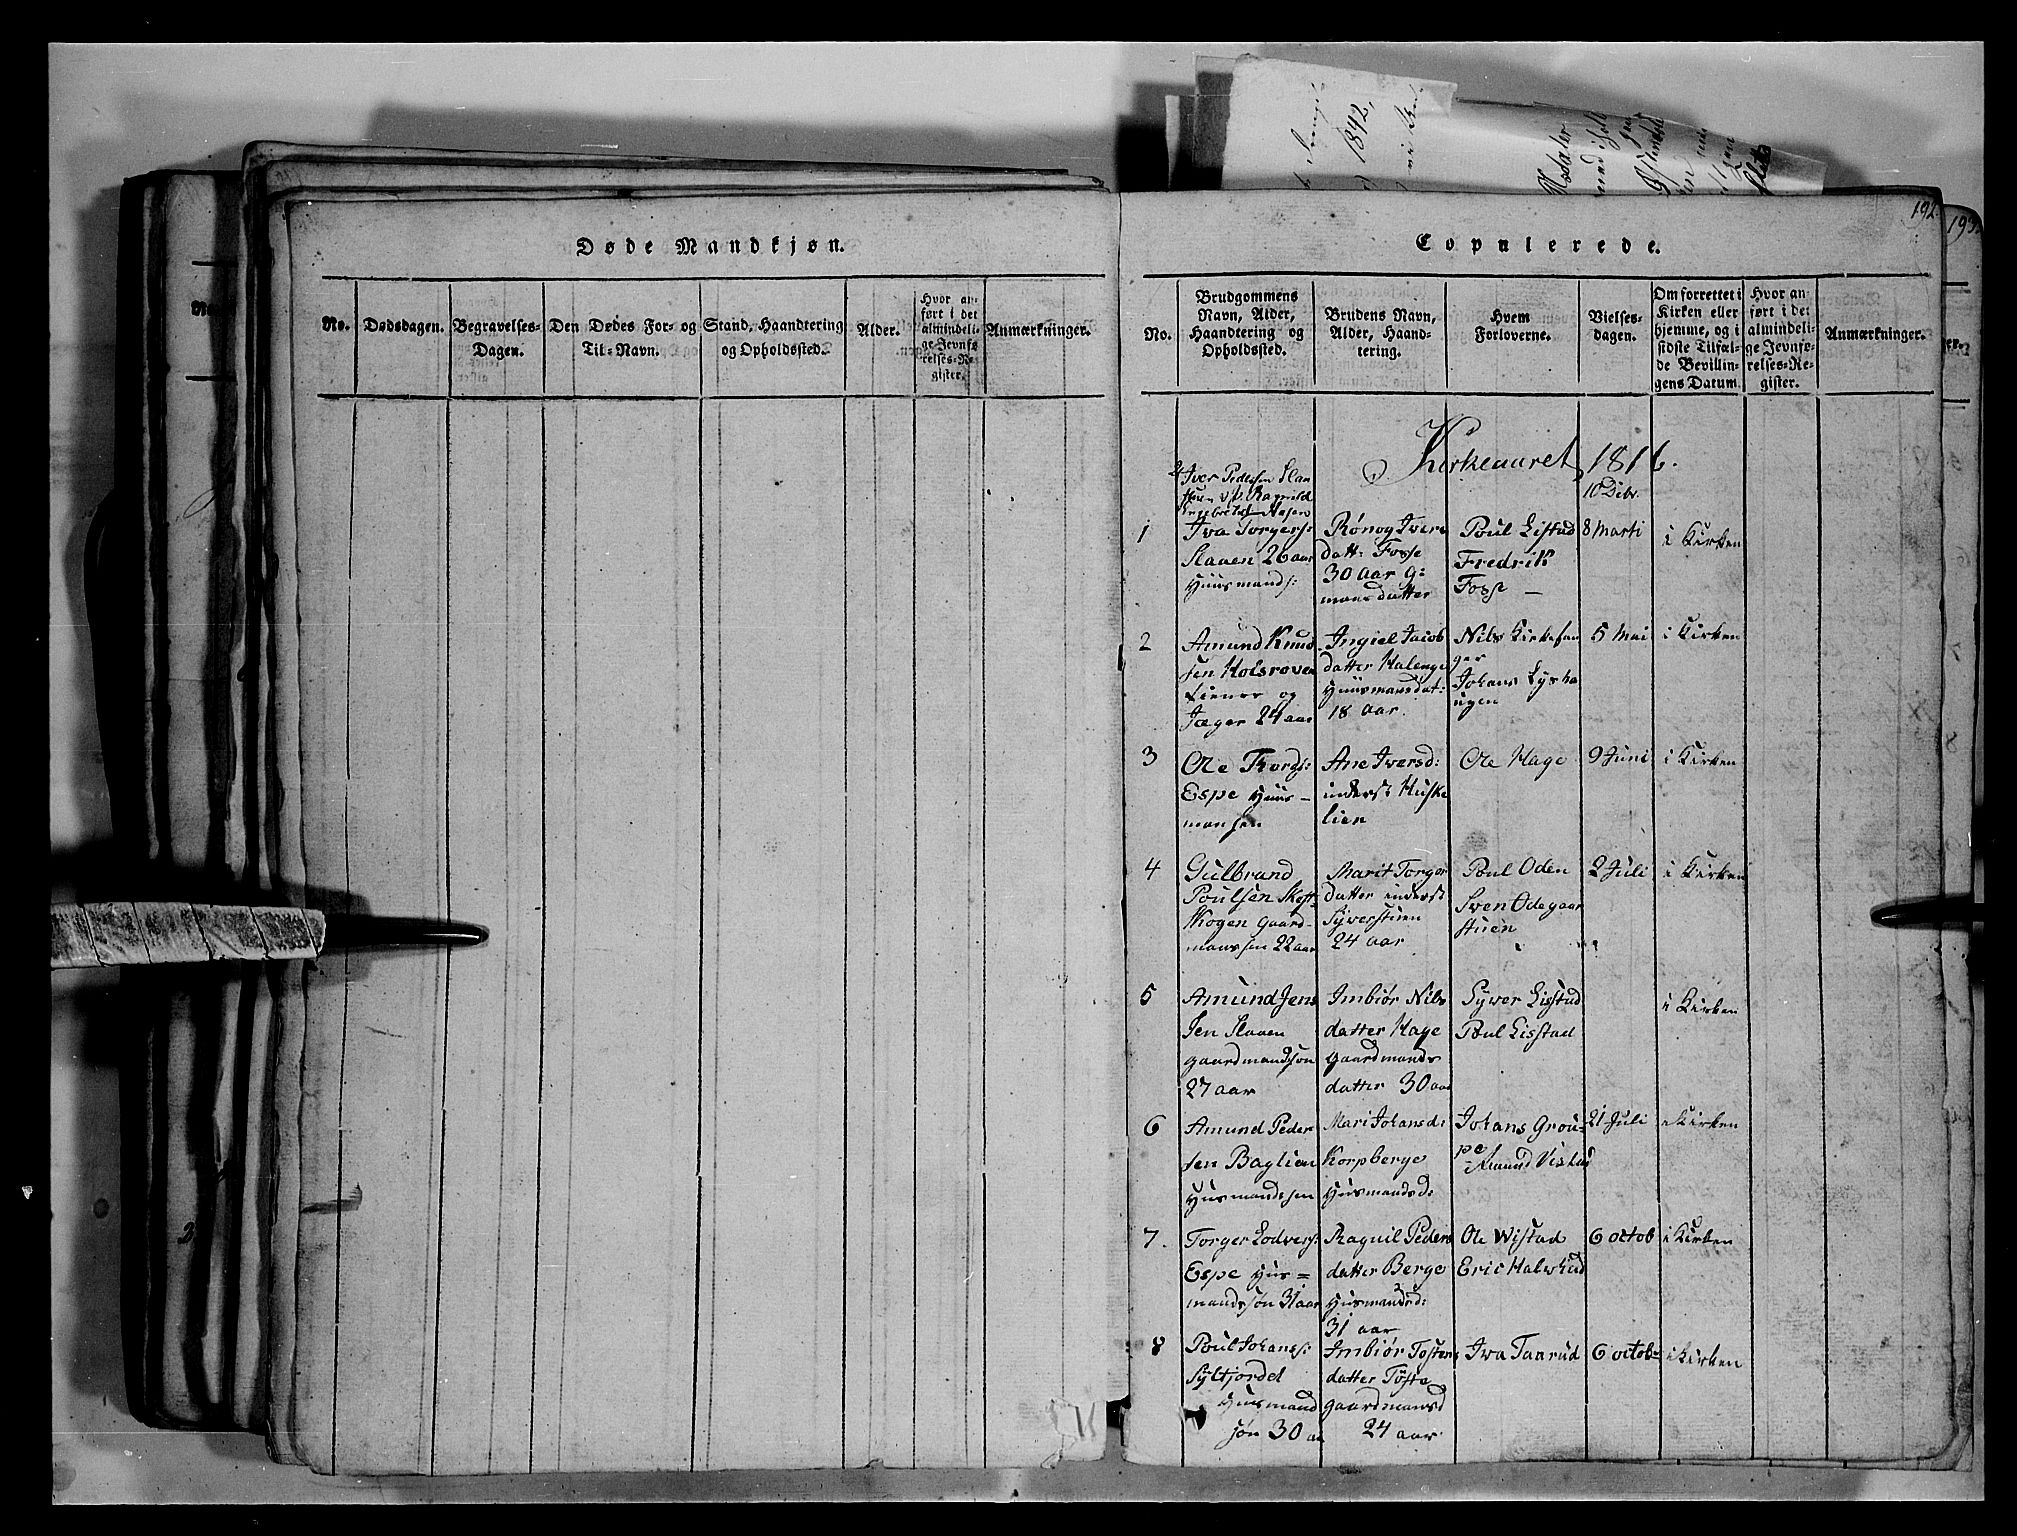 SAH, Fron prestekontor, H/Ha/Hab/L0003: Klokkerbok nr. 3, 1816-1850, s. 192